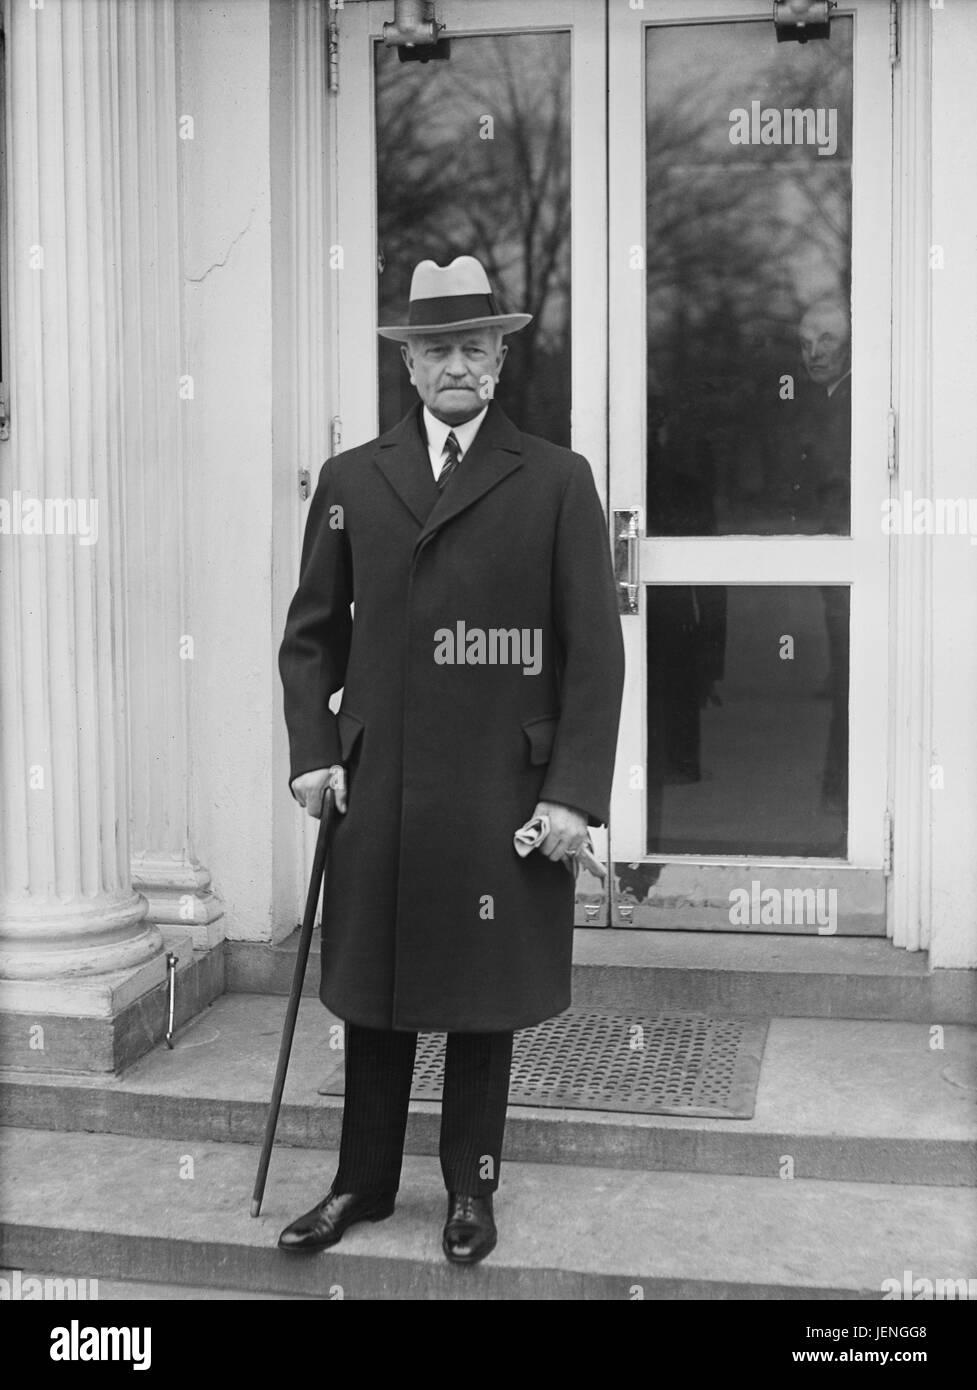 John J. Pershing, Portrait at White House, Washington DC, USA, Harris & Ewing, 1932 - Stock Image